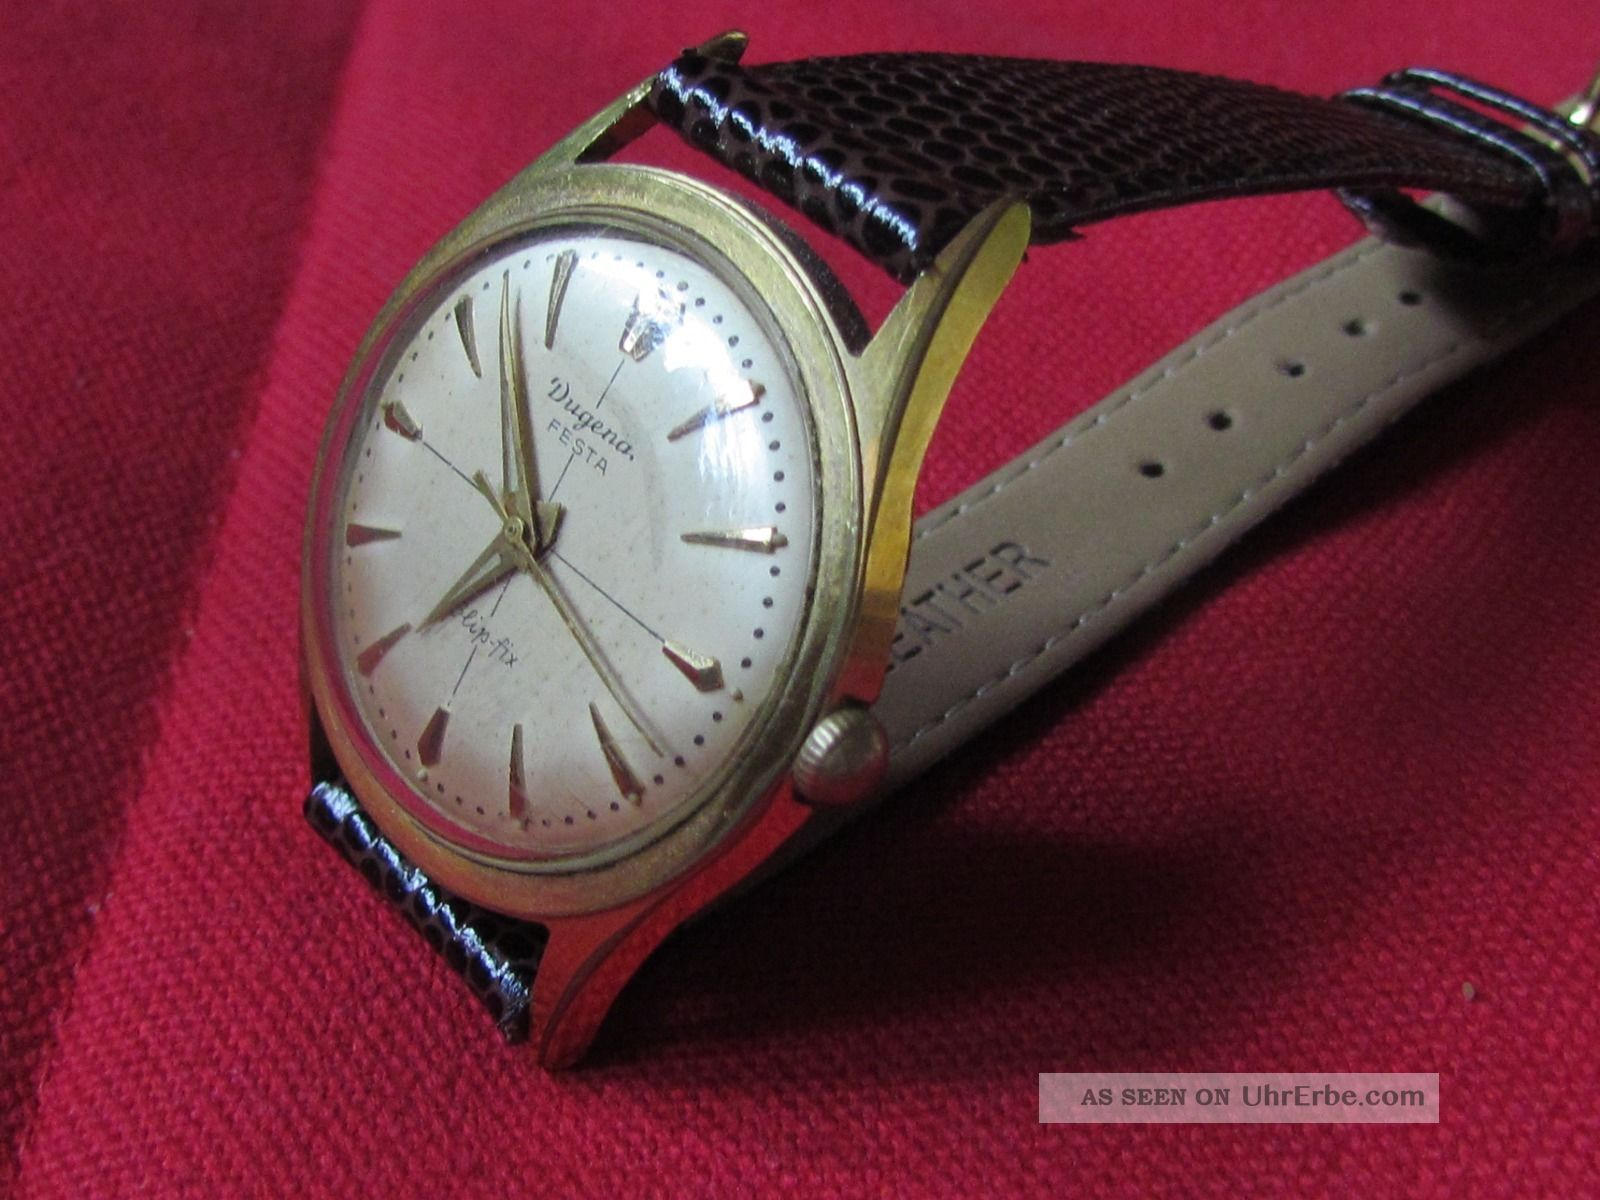 Dugena Festa - Schöner Klassiker - Armbanduhren Bild